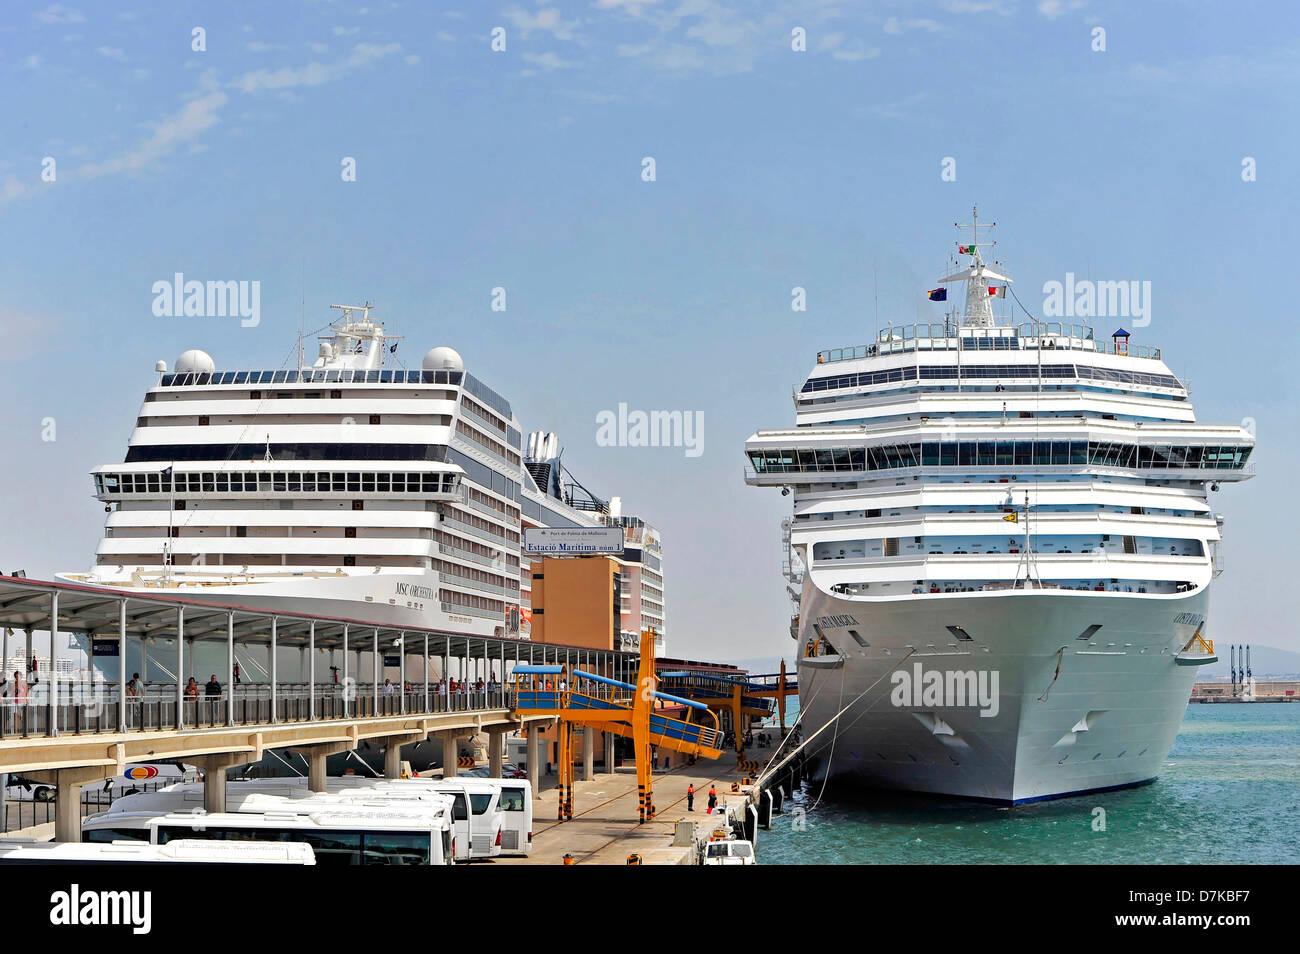 Ship, cruise, cruise ships in the harbor of Genova, Italy - Stock Image